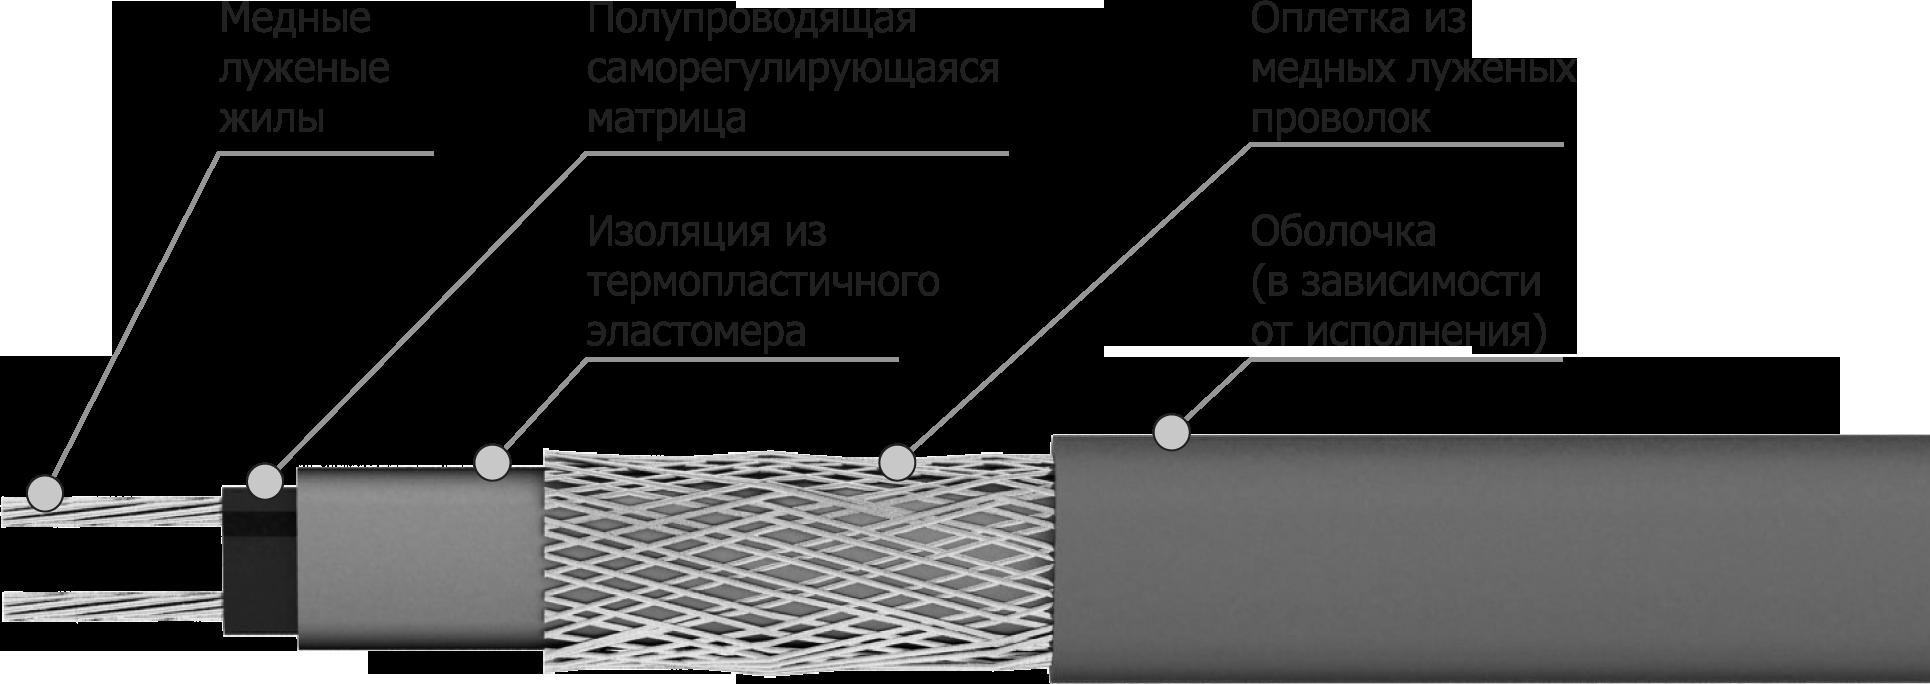 саморегулирующийся кабель VC